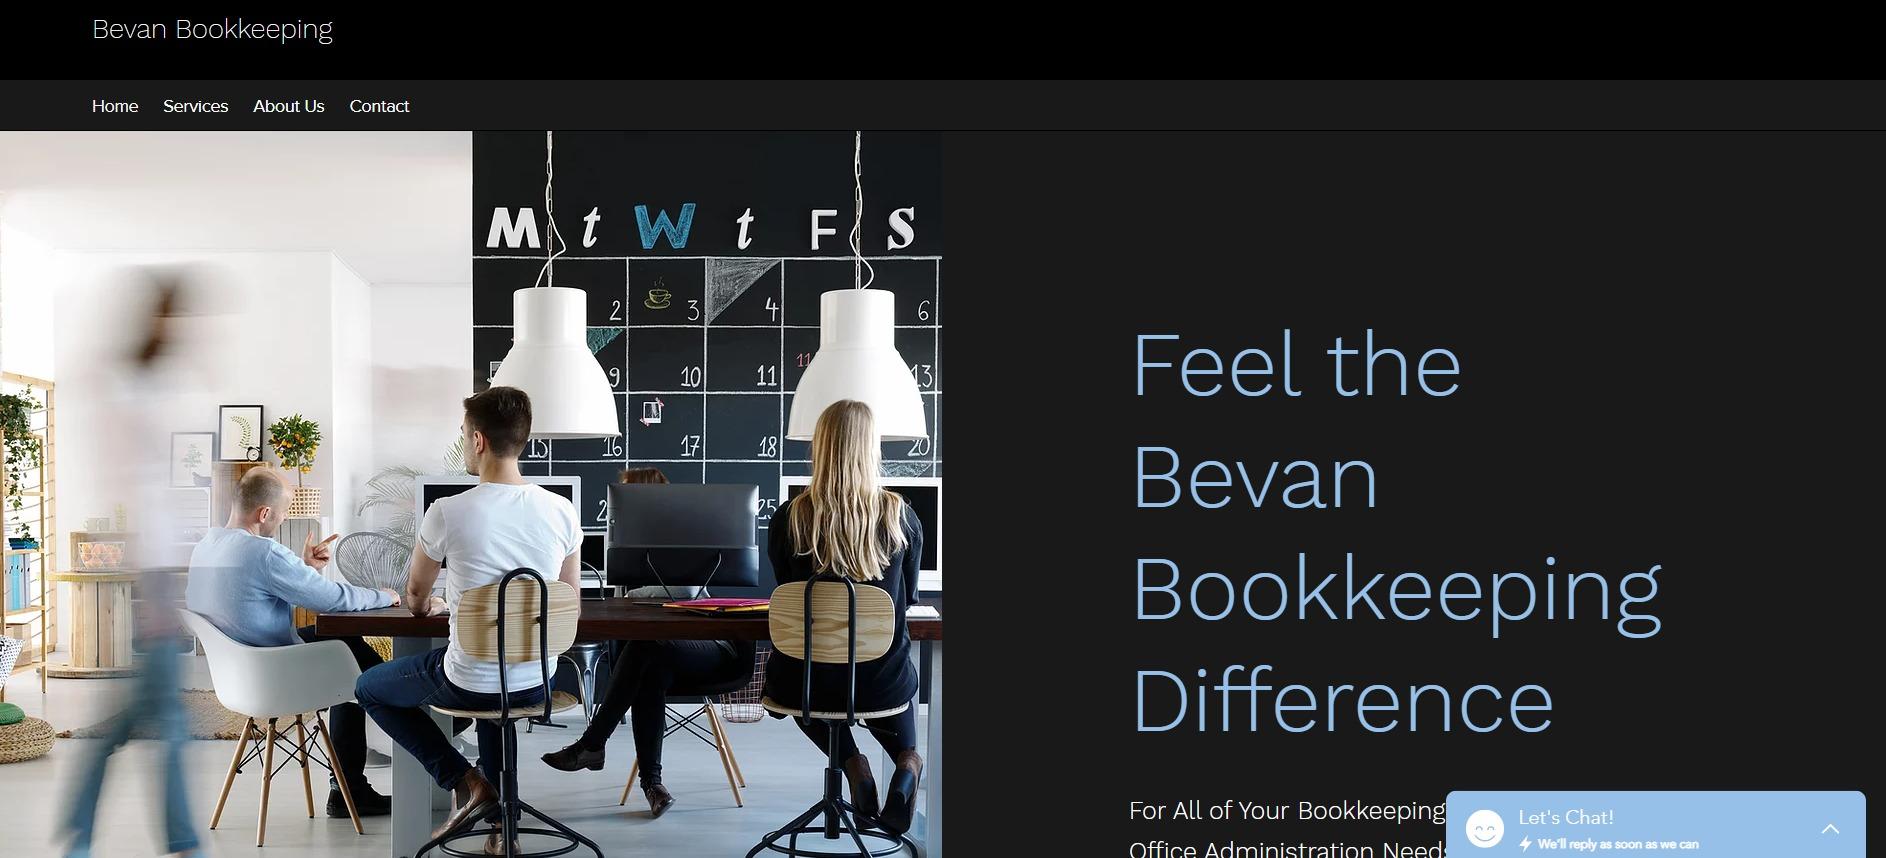 Bevan Bookkeeping